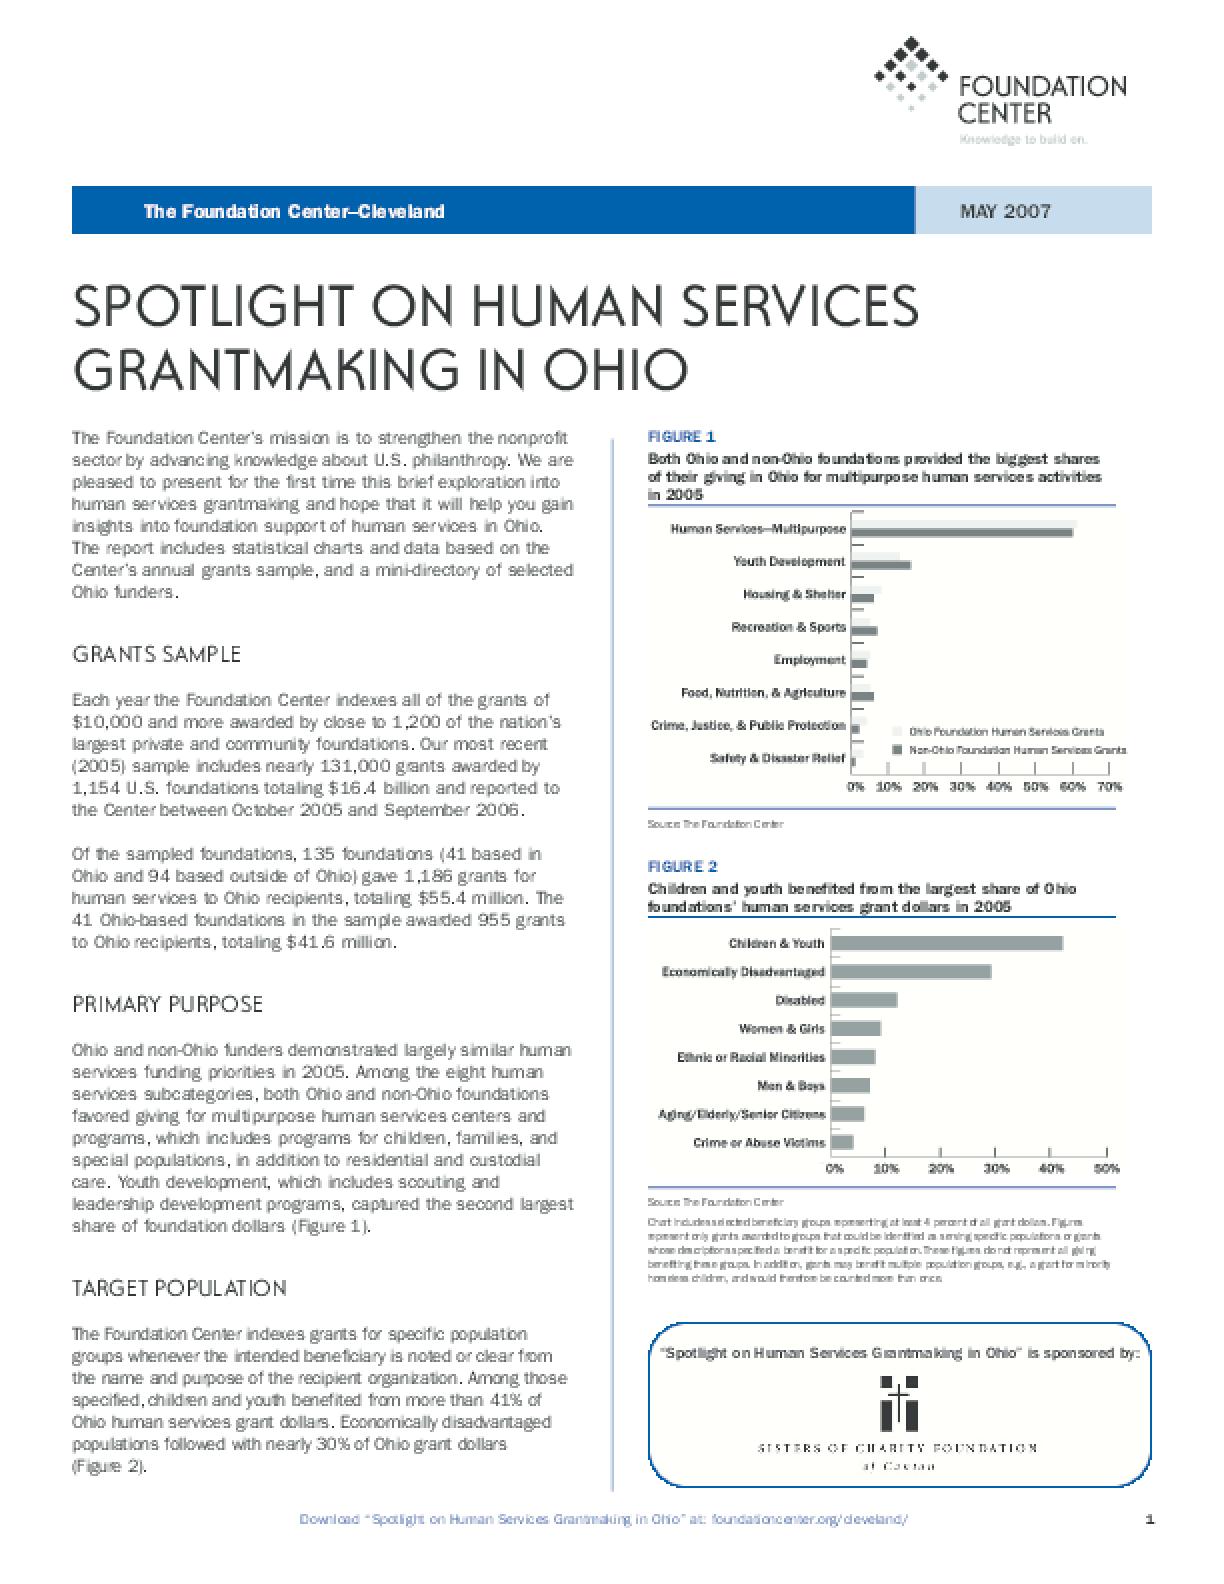 Spotlight on Human Services Grantmaking in Ohio